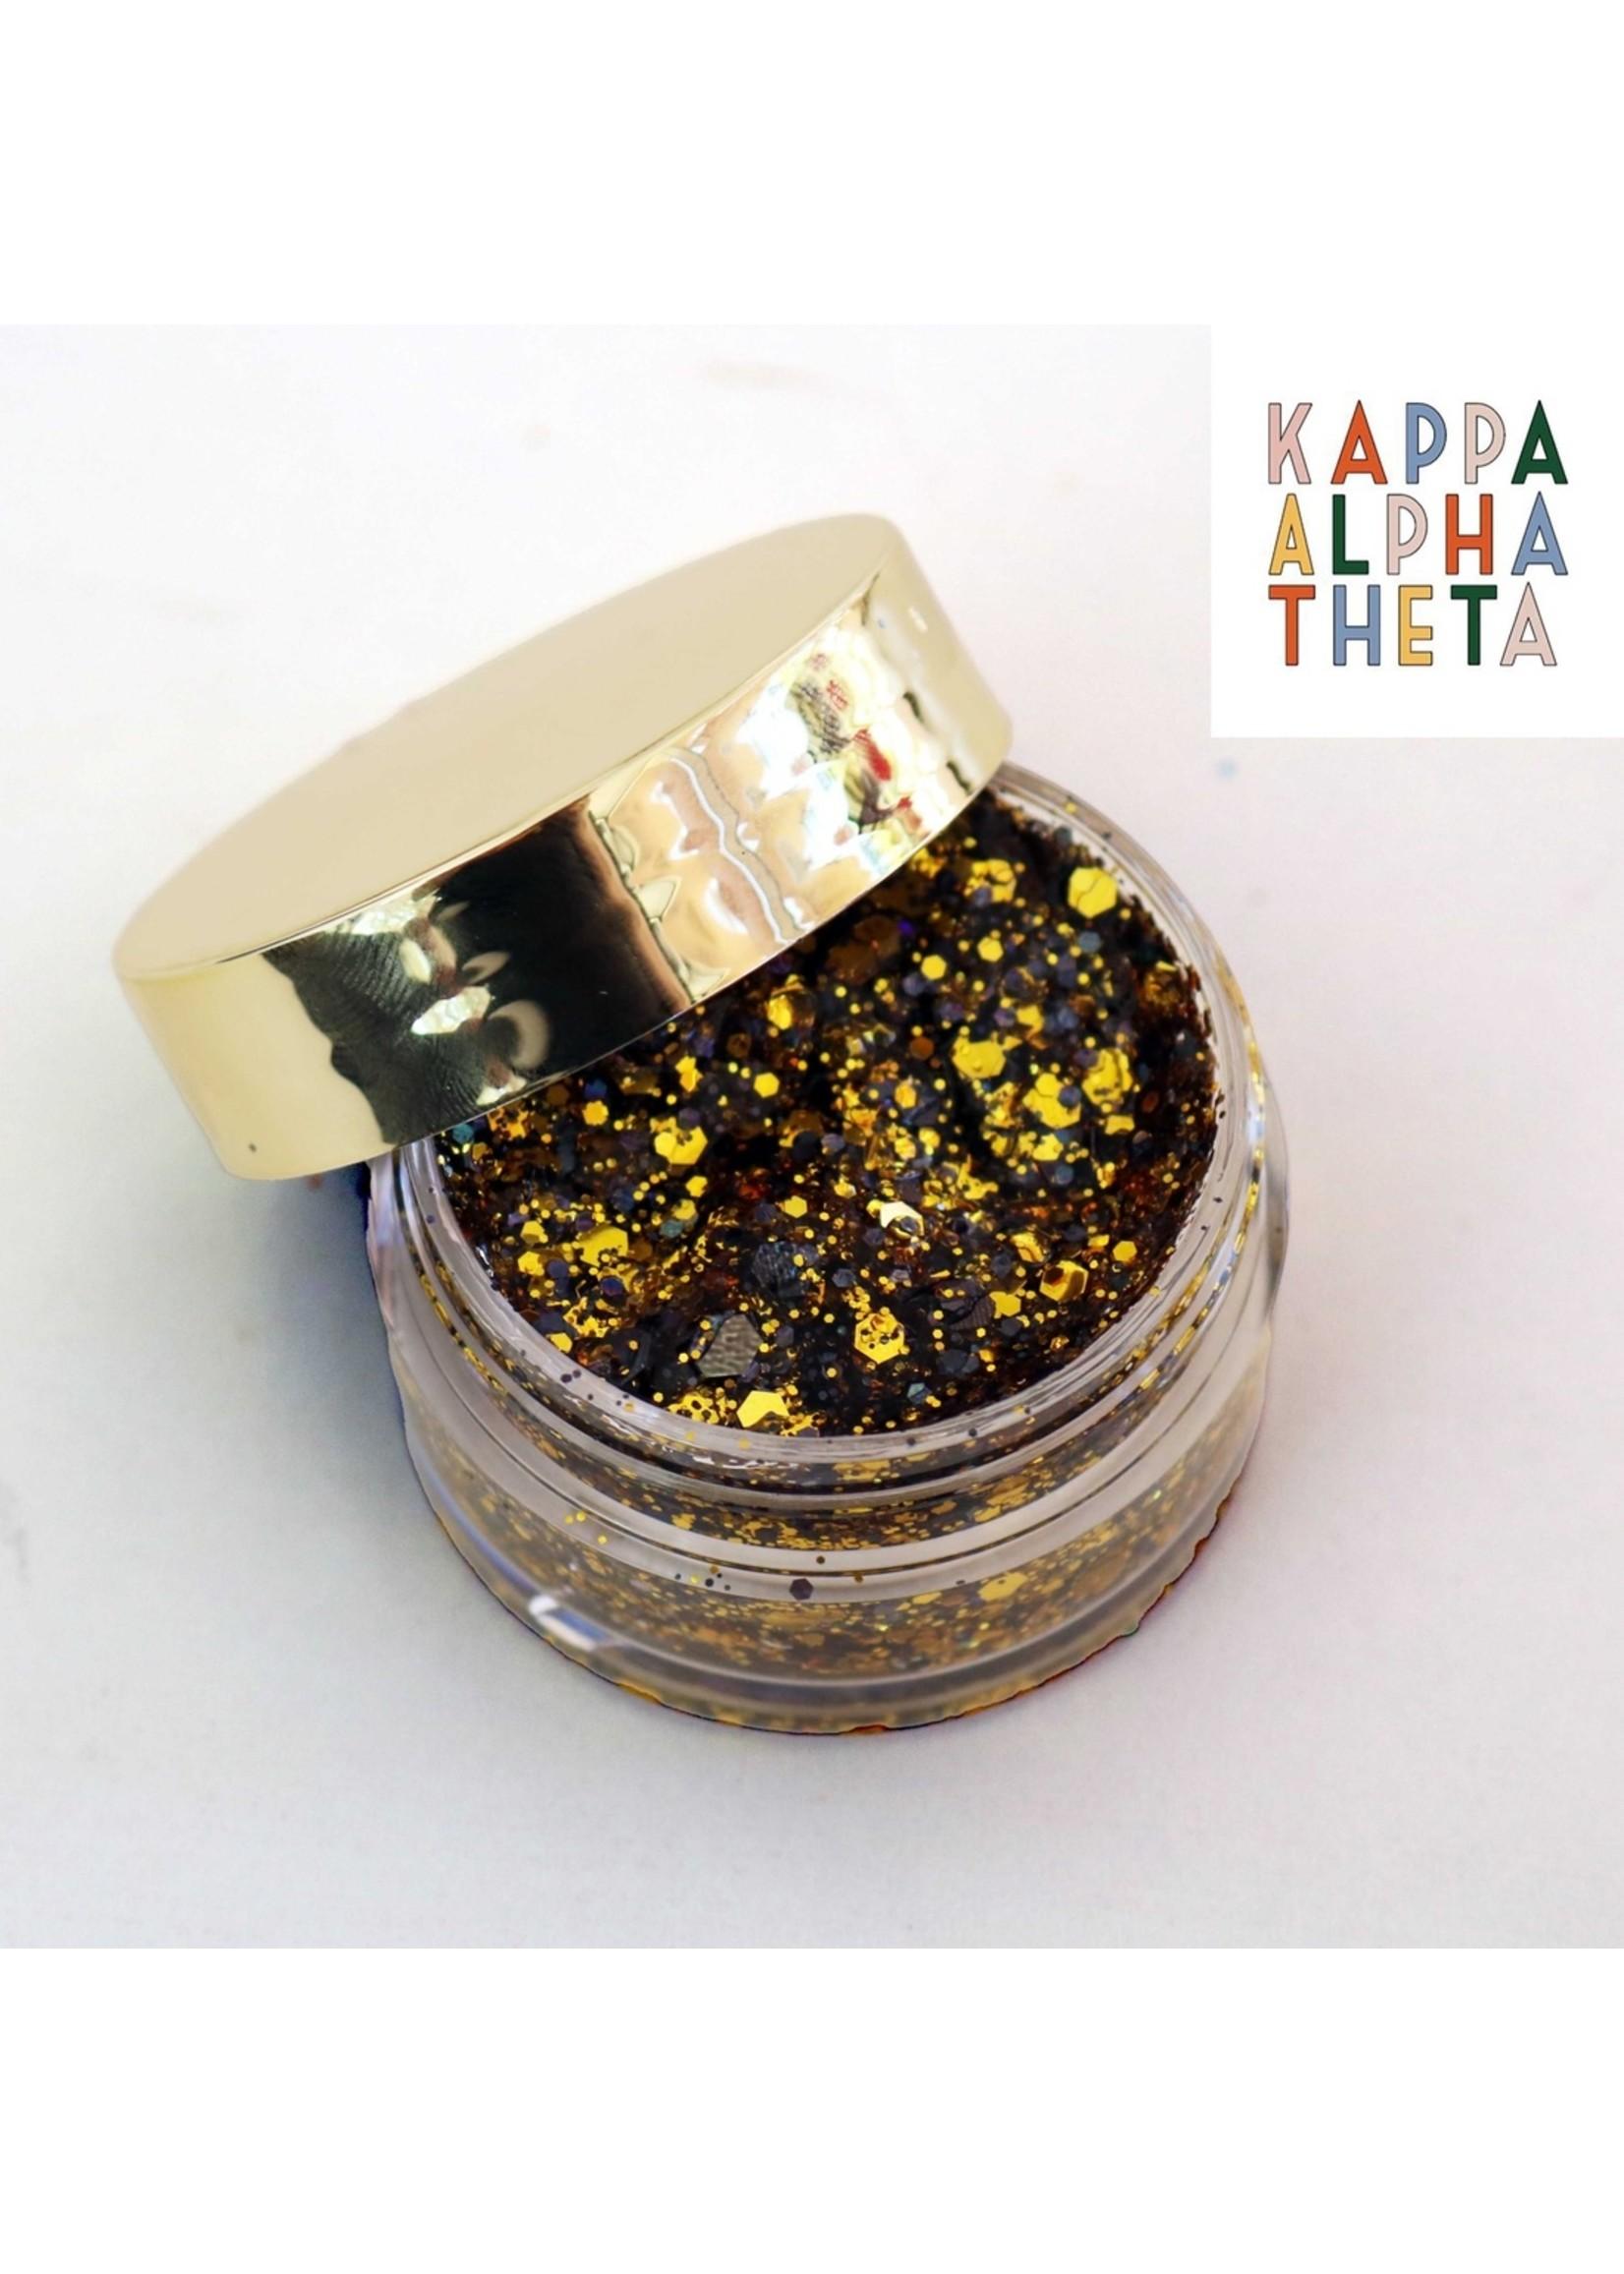 Kizmet Cosmetics Face Glitter - Kappa Alpha Theta